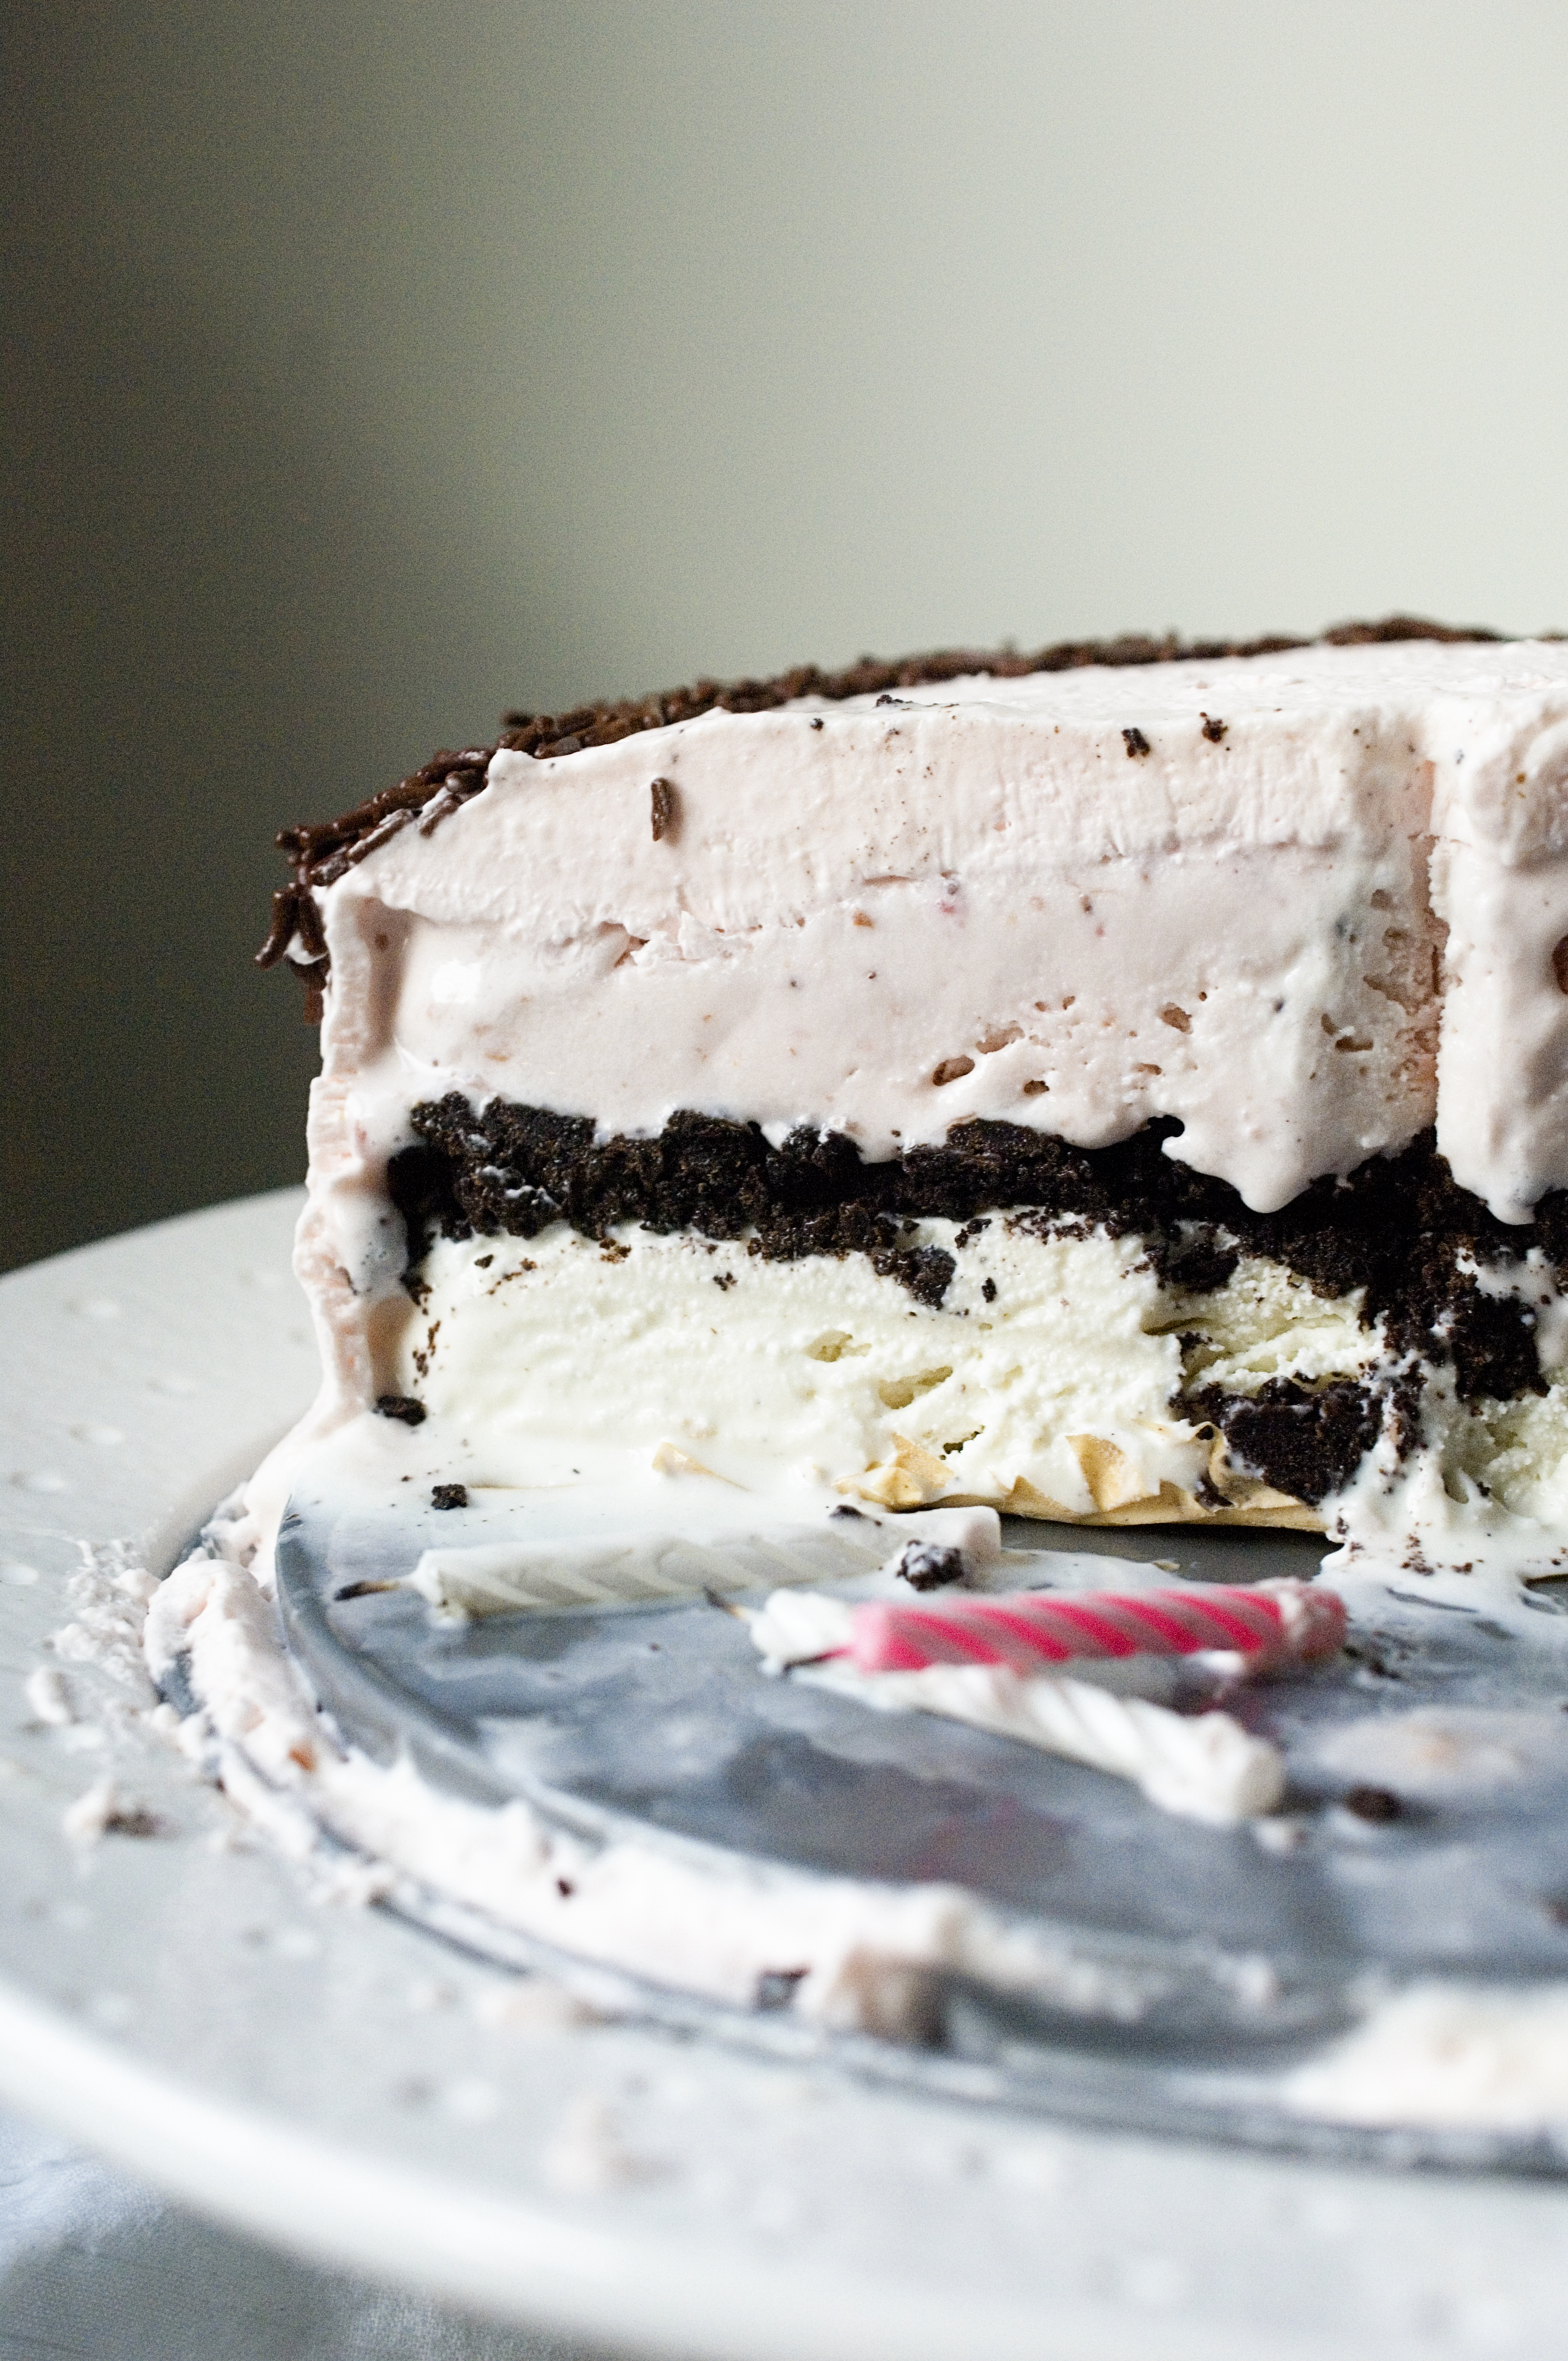 Make a carvel ice cream cake